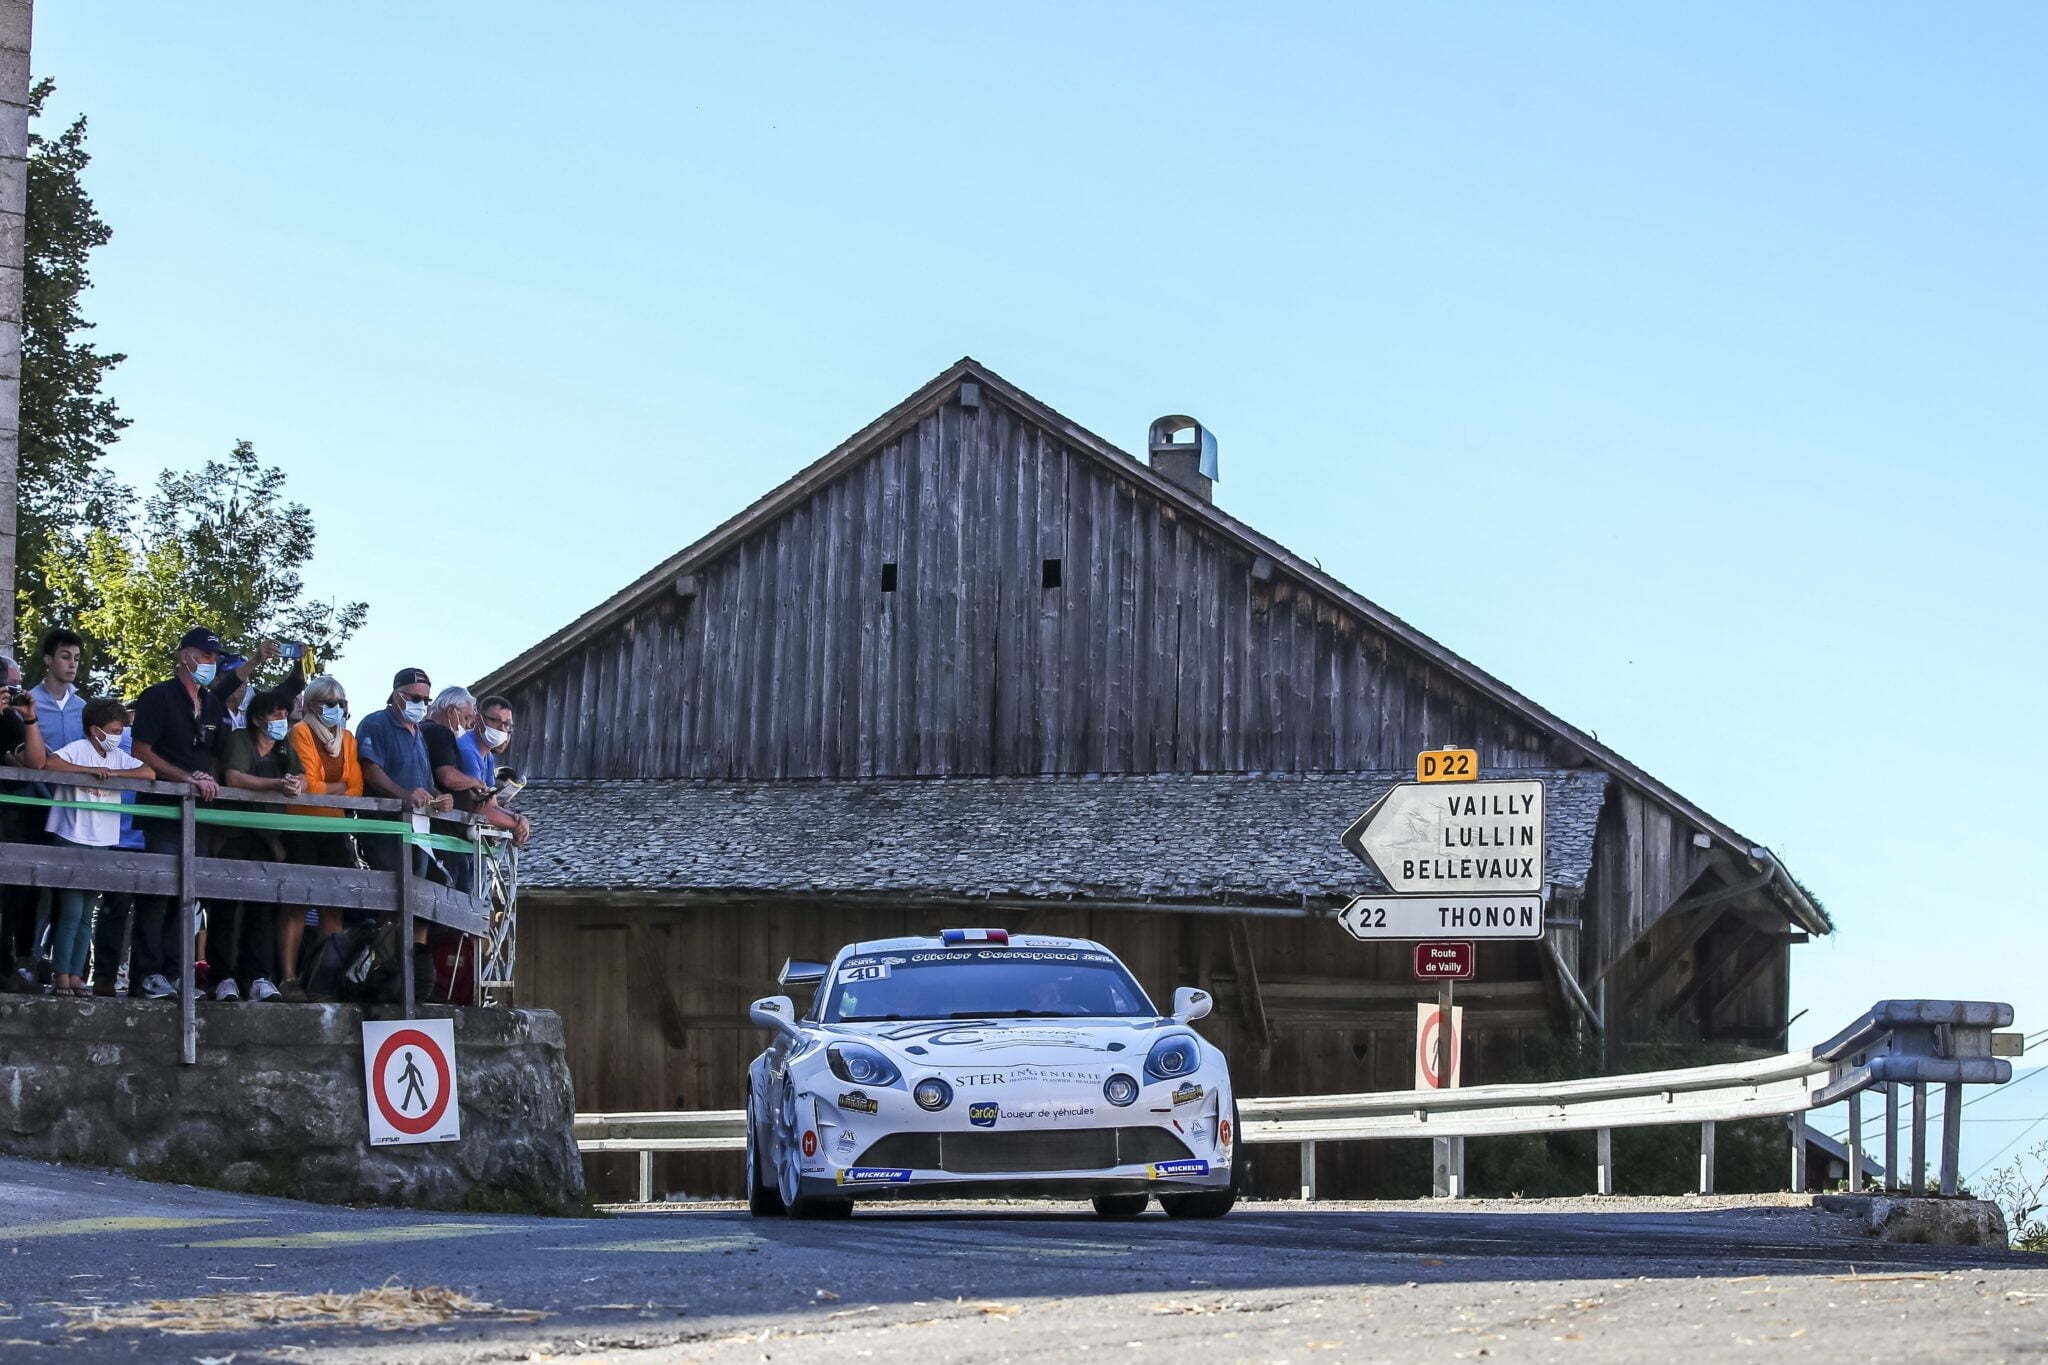 Alpine A110 Rally Mont Blanc Morzine Rallye FFSA 2020 2 | Alpine A110 Rally: Carton plein au rallye Mont-Blanc Morzine 2020